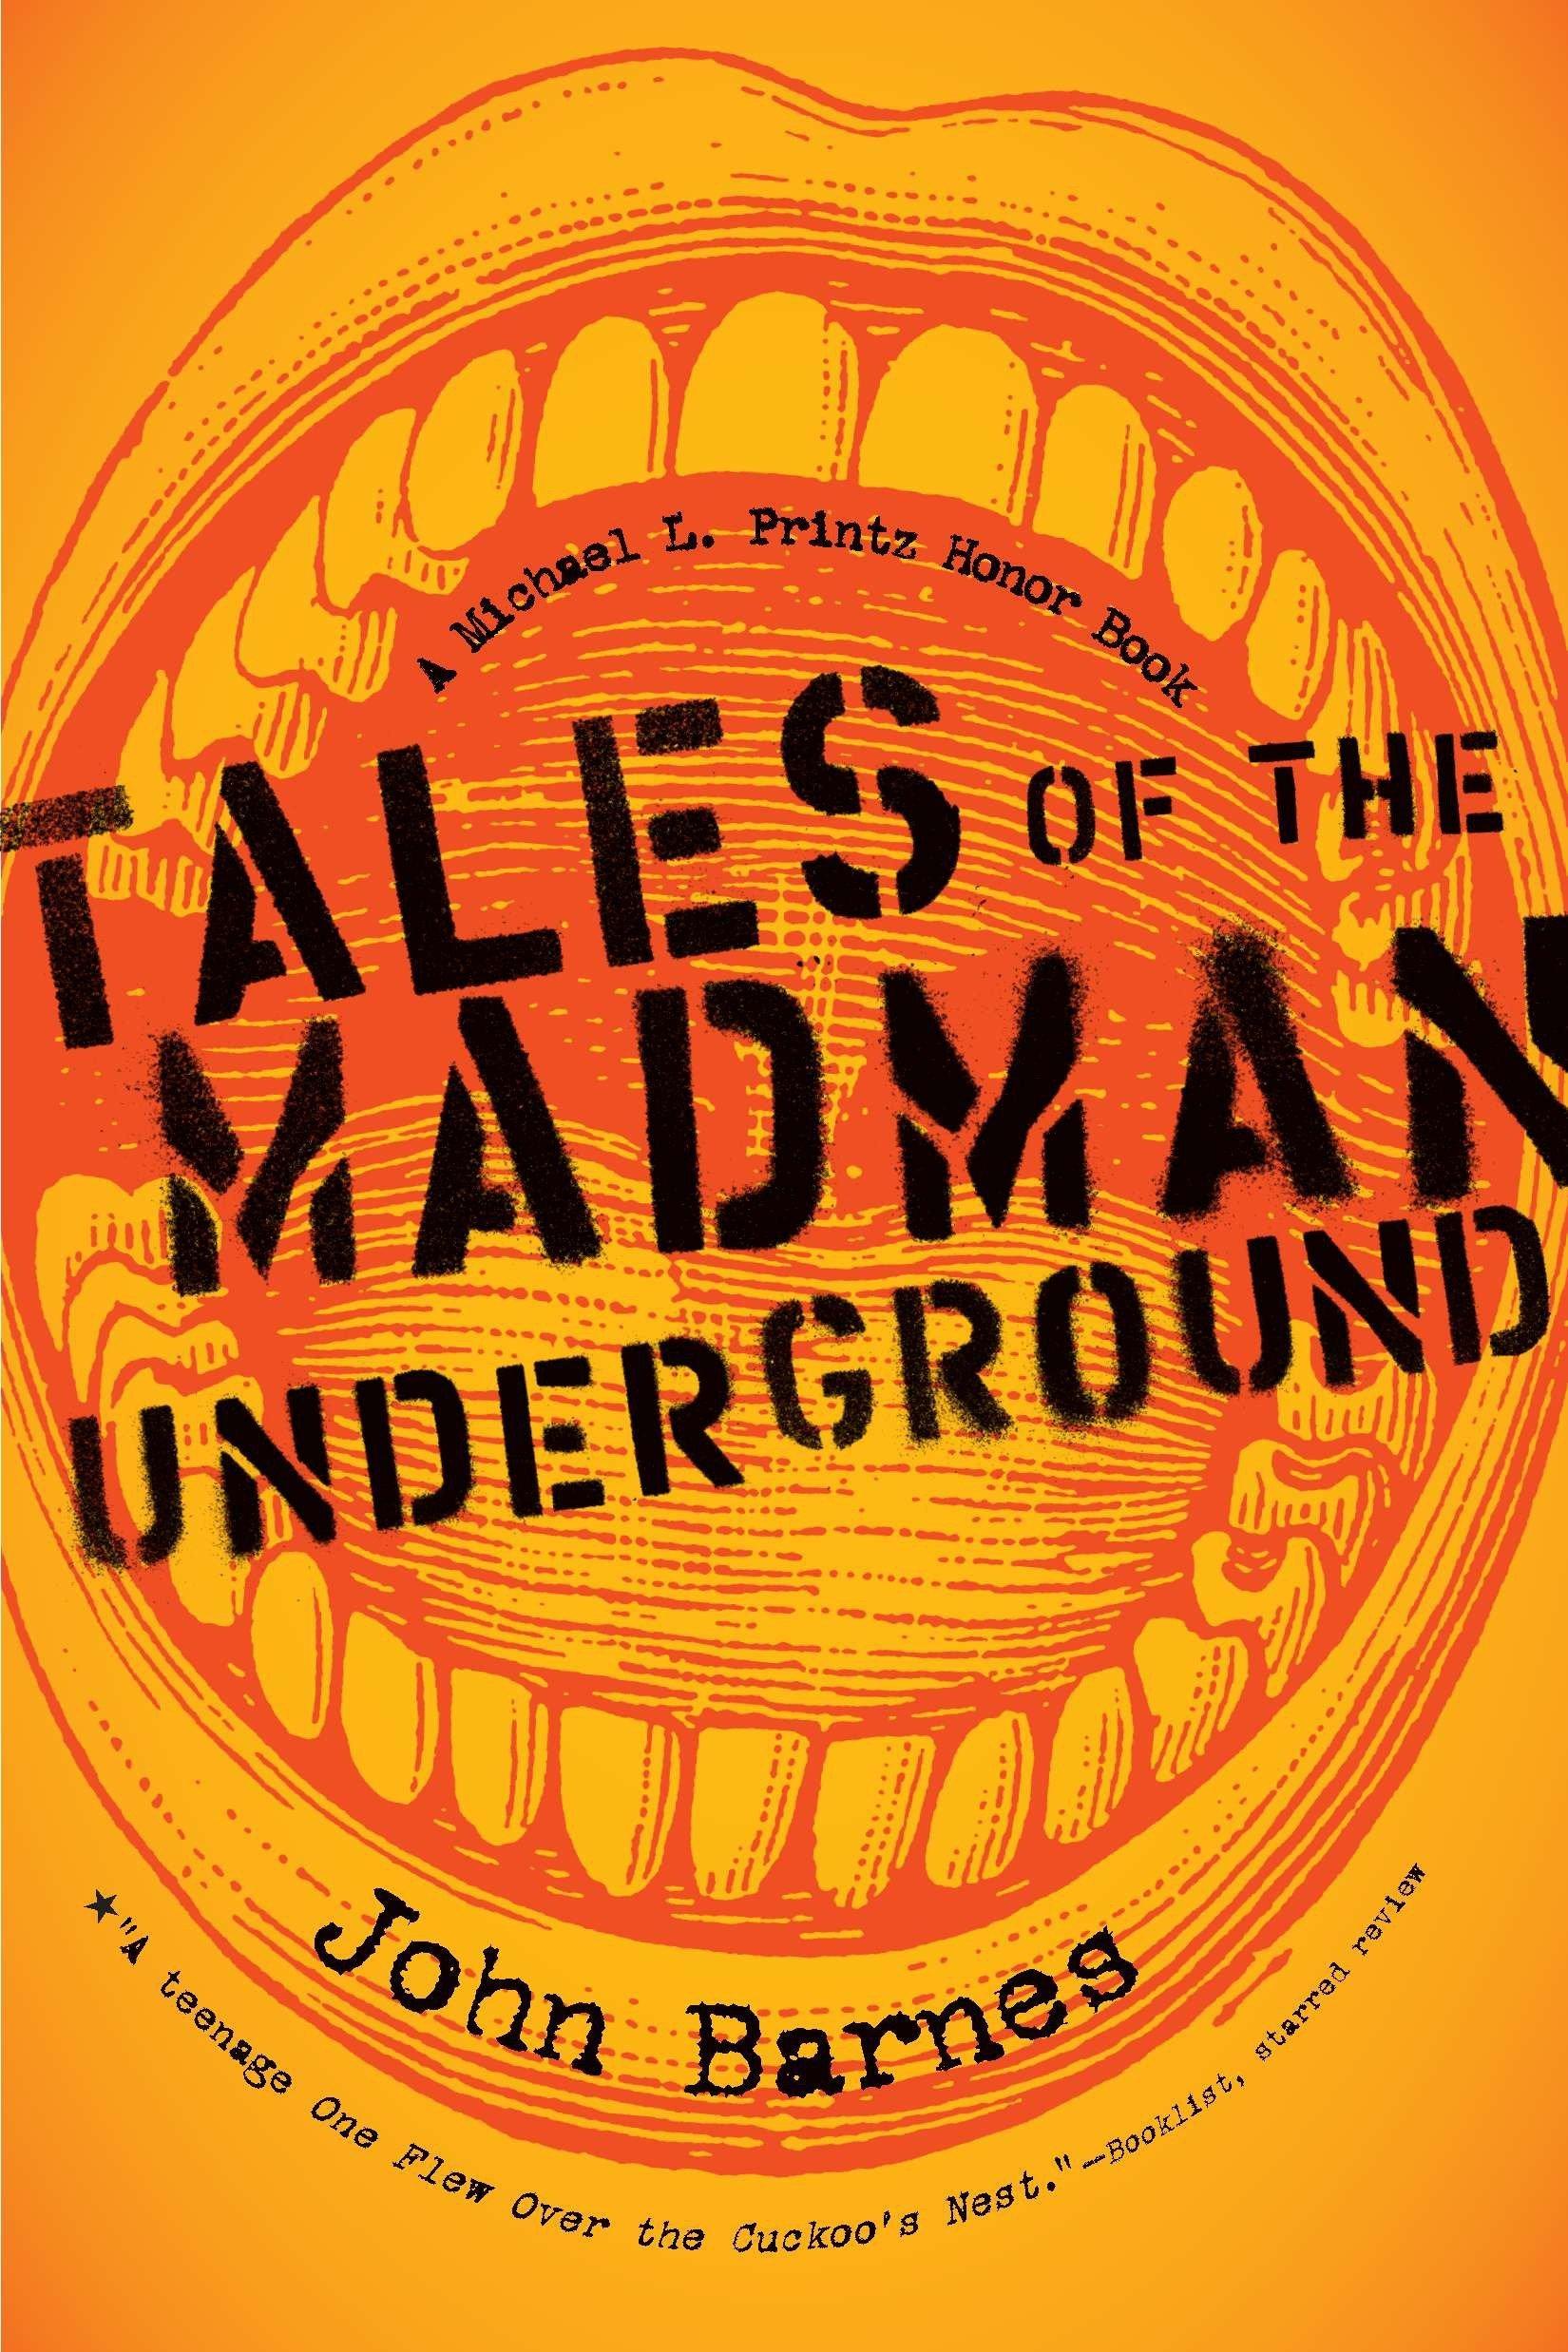 Tales of the Madman Underground: Amazon.es: John Barnes: Libros en idiomas extranjeros